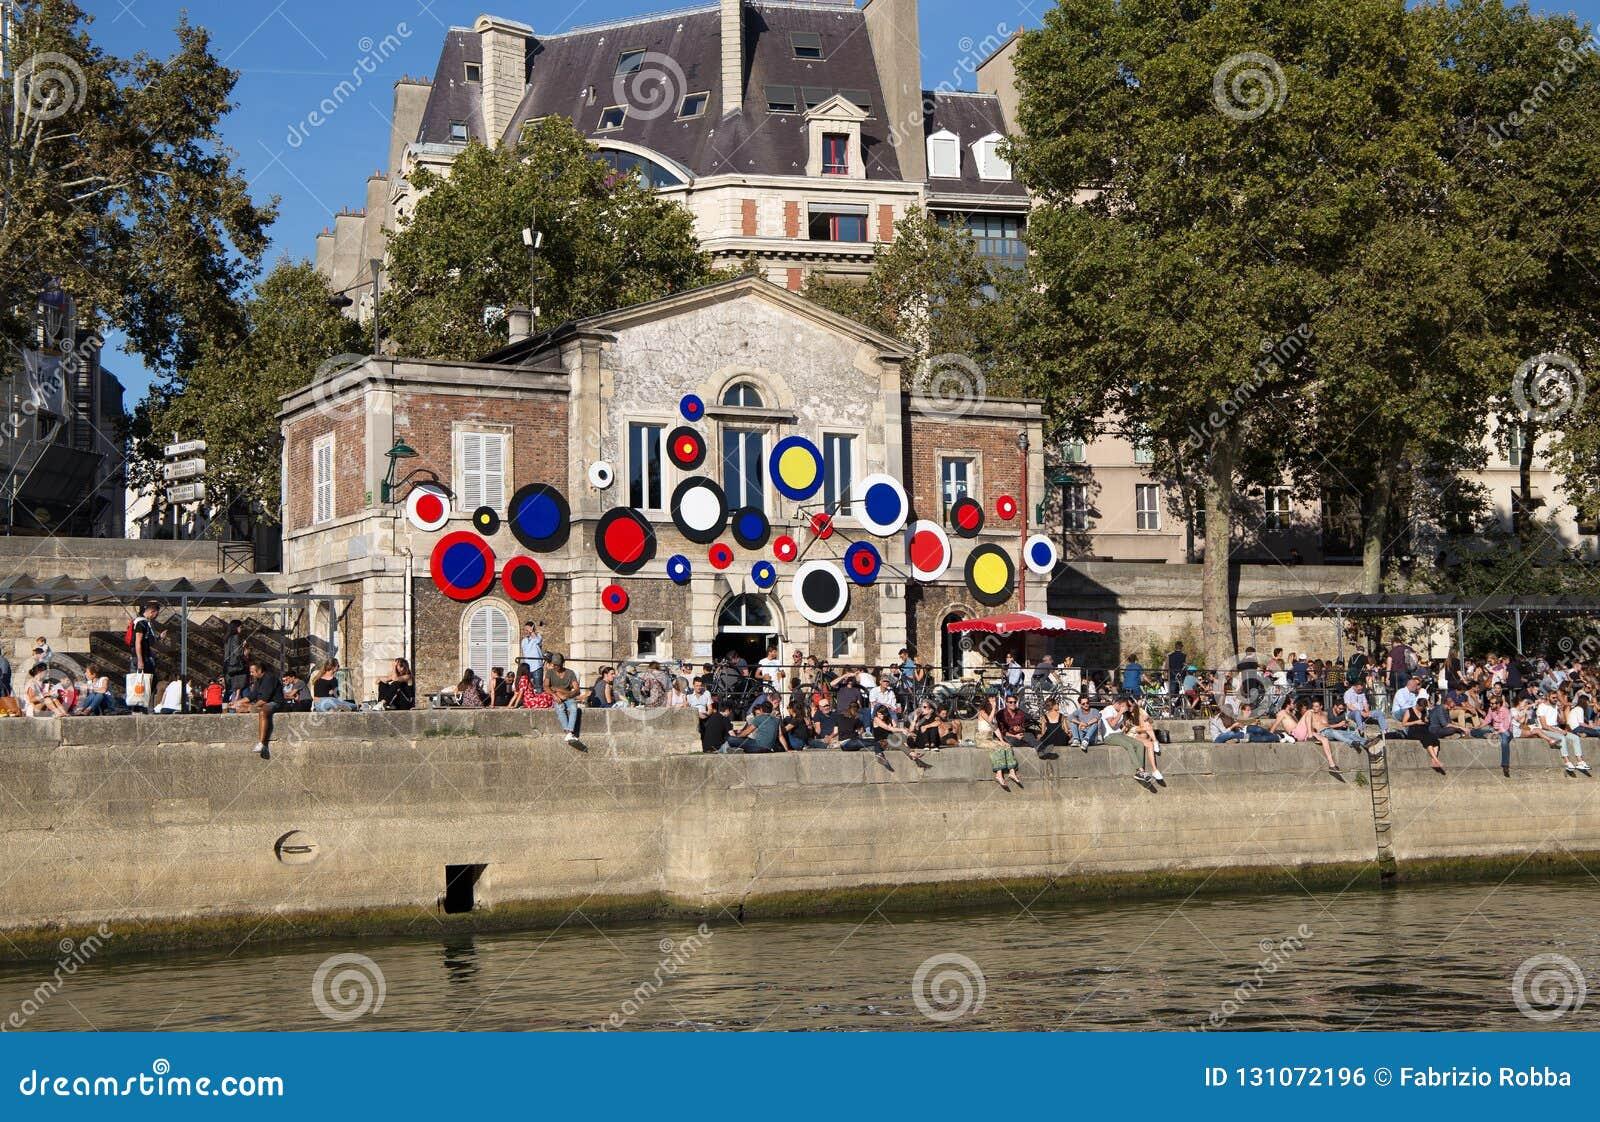 Folket sitter längs kusterna av floden Seine i en solig dag i Paris, Frankrike